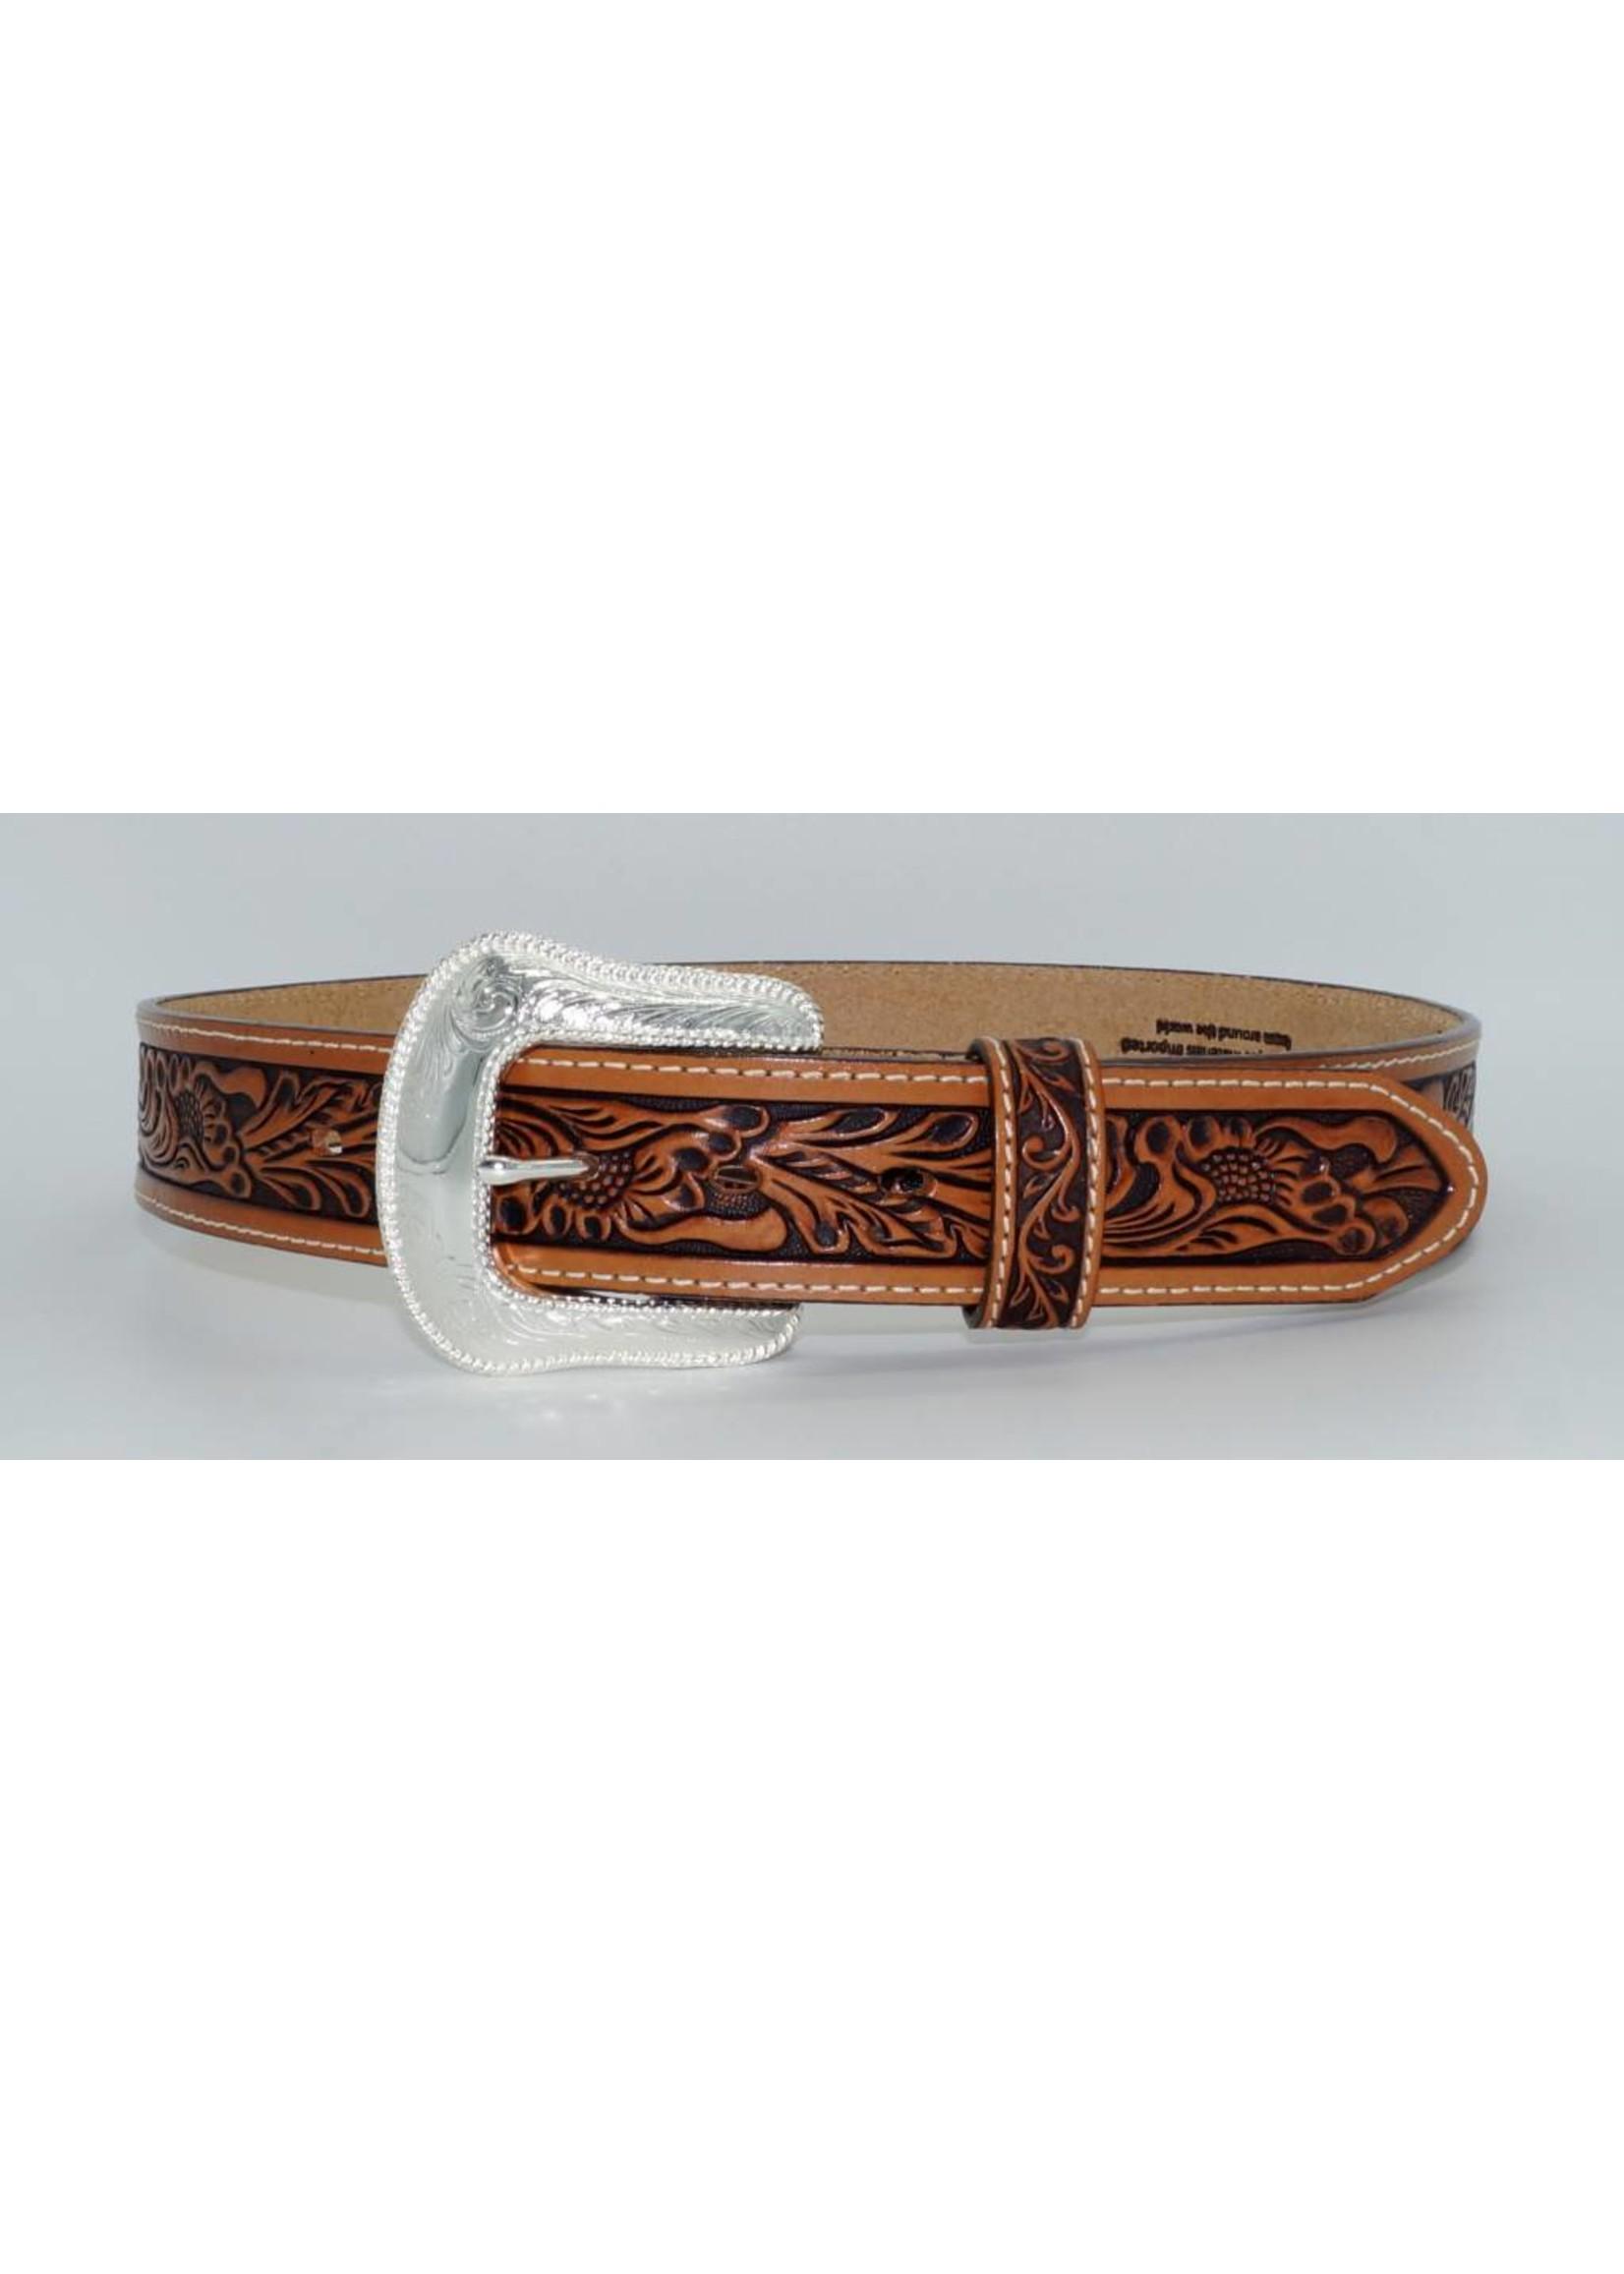 Tony Lama Men's USA Made Patriot Top Grain Leather Belt C13734